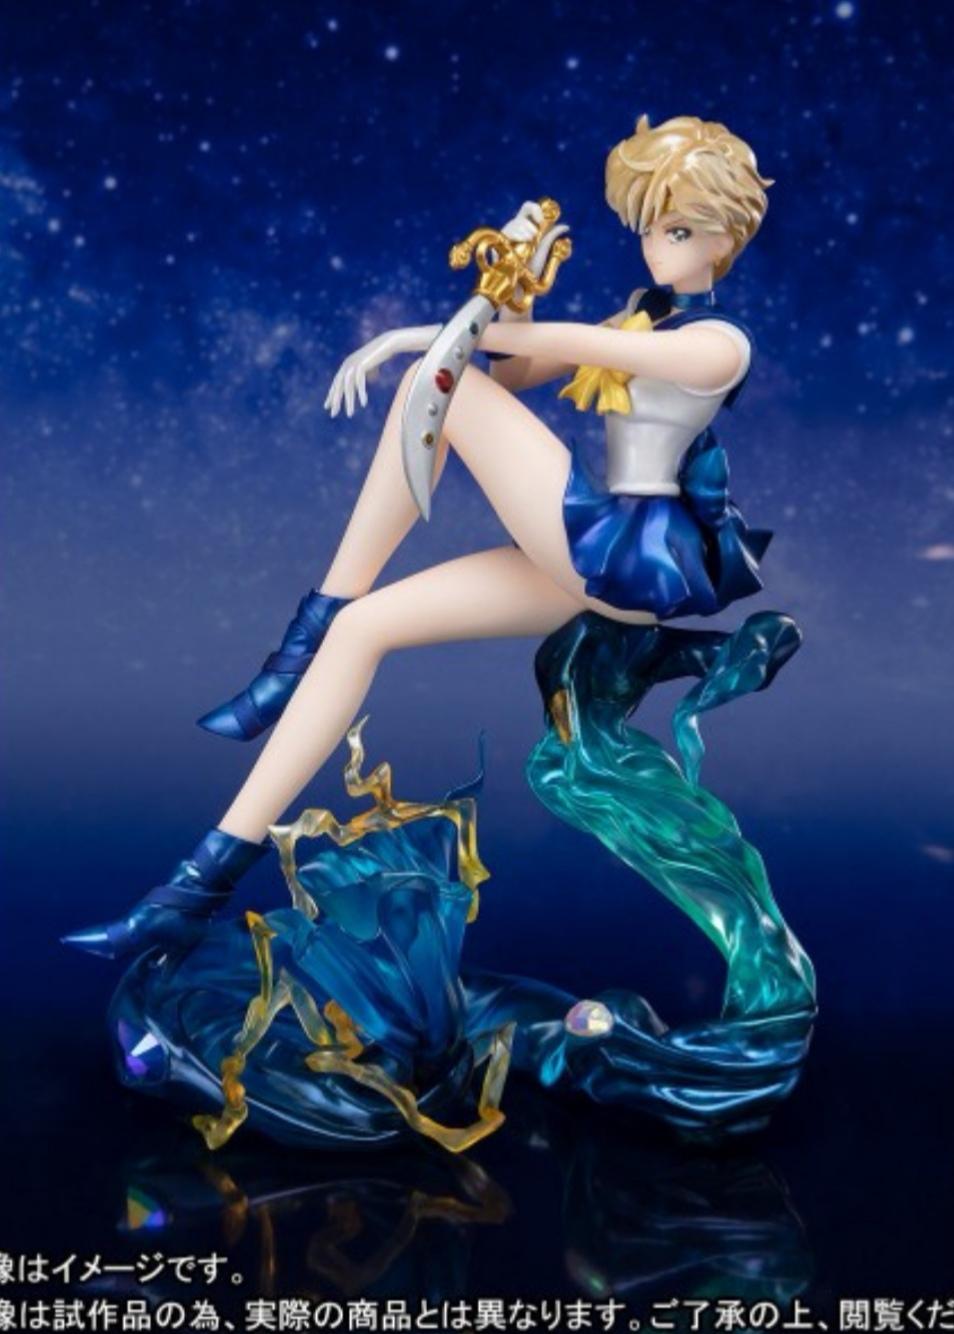 Sailor moon figuarts zéro chouette sailor uranus.  Img_2365